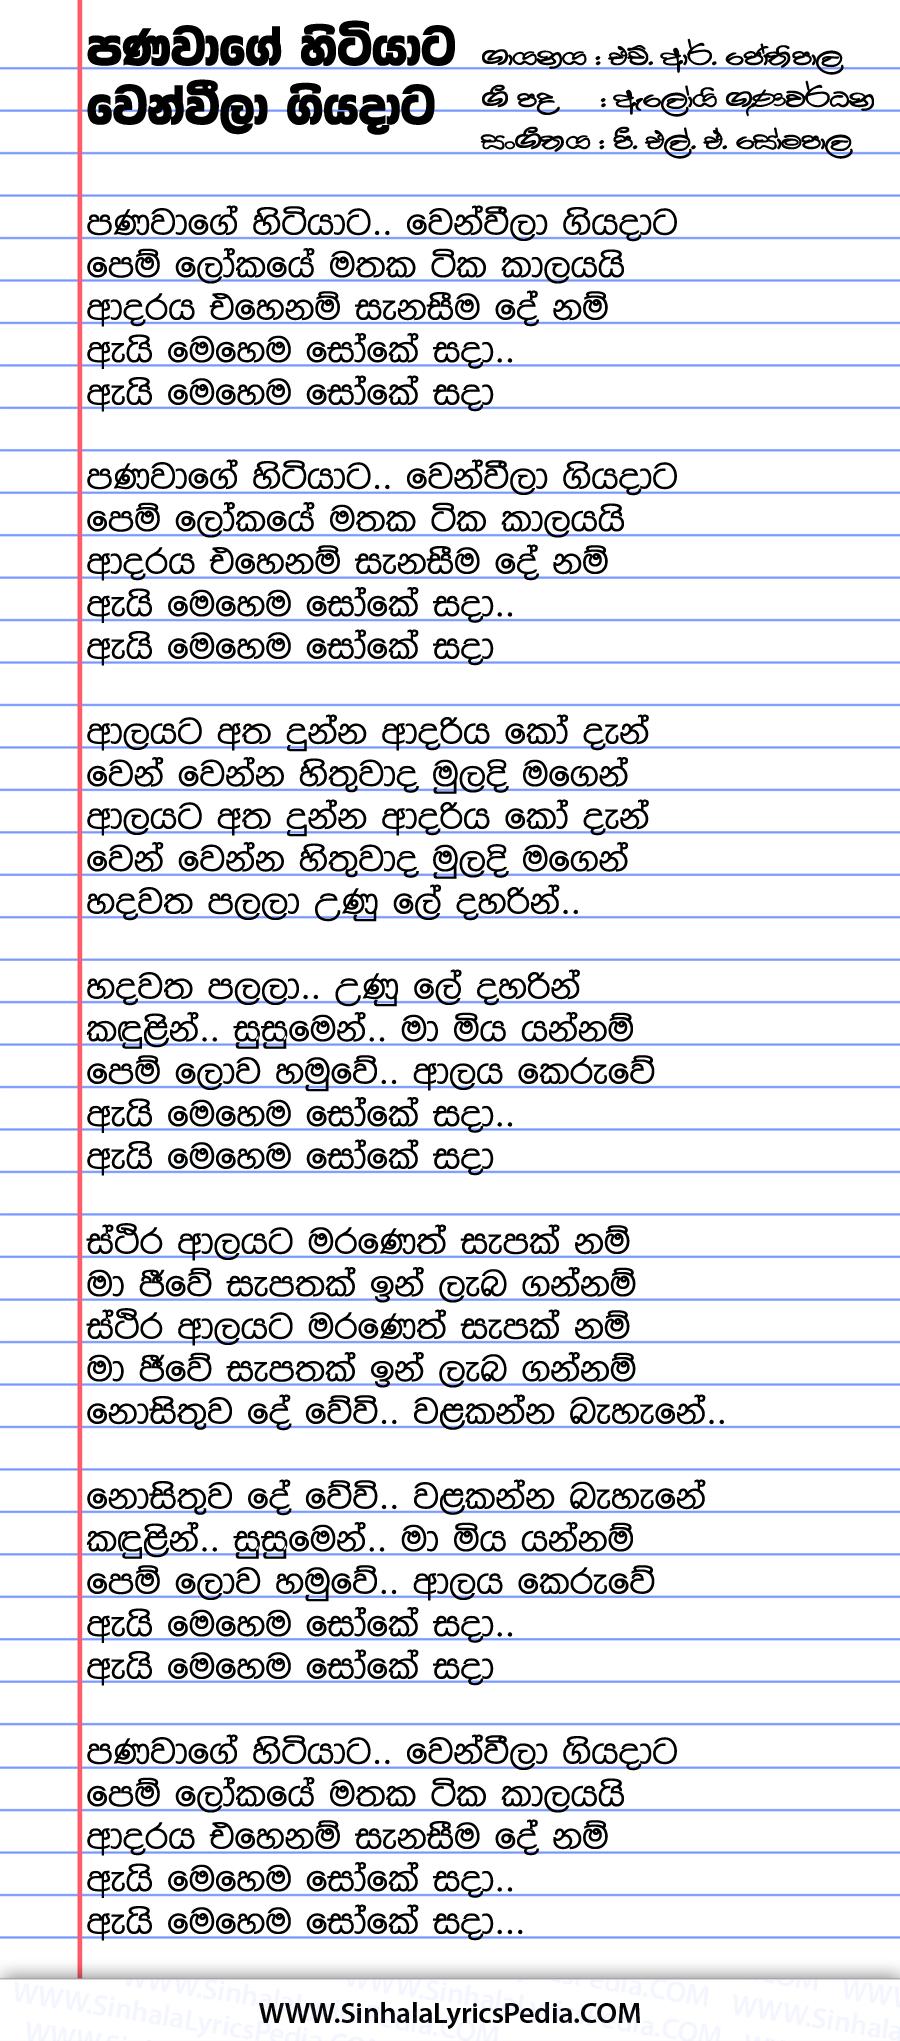 Pana Wage Hitiyata Wenweela Giya Data Song Lyrics